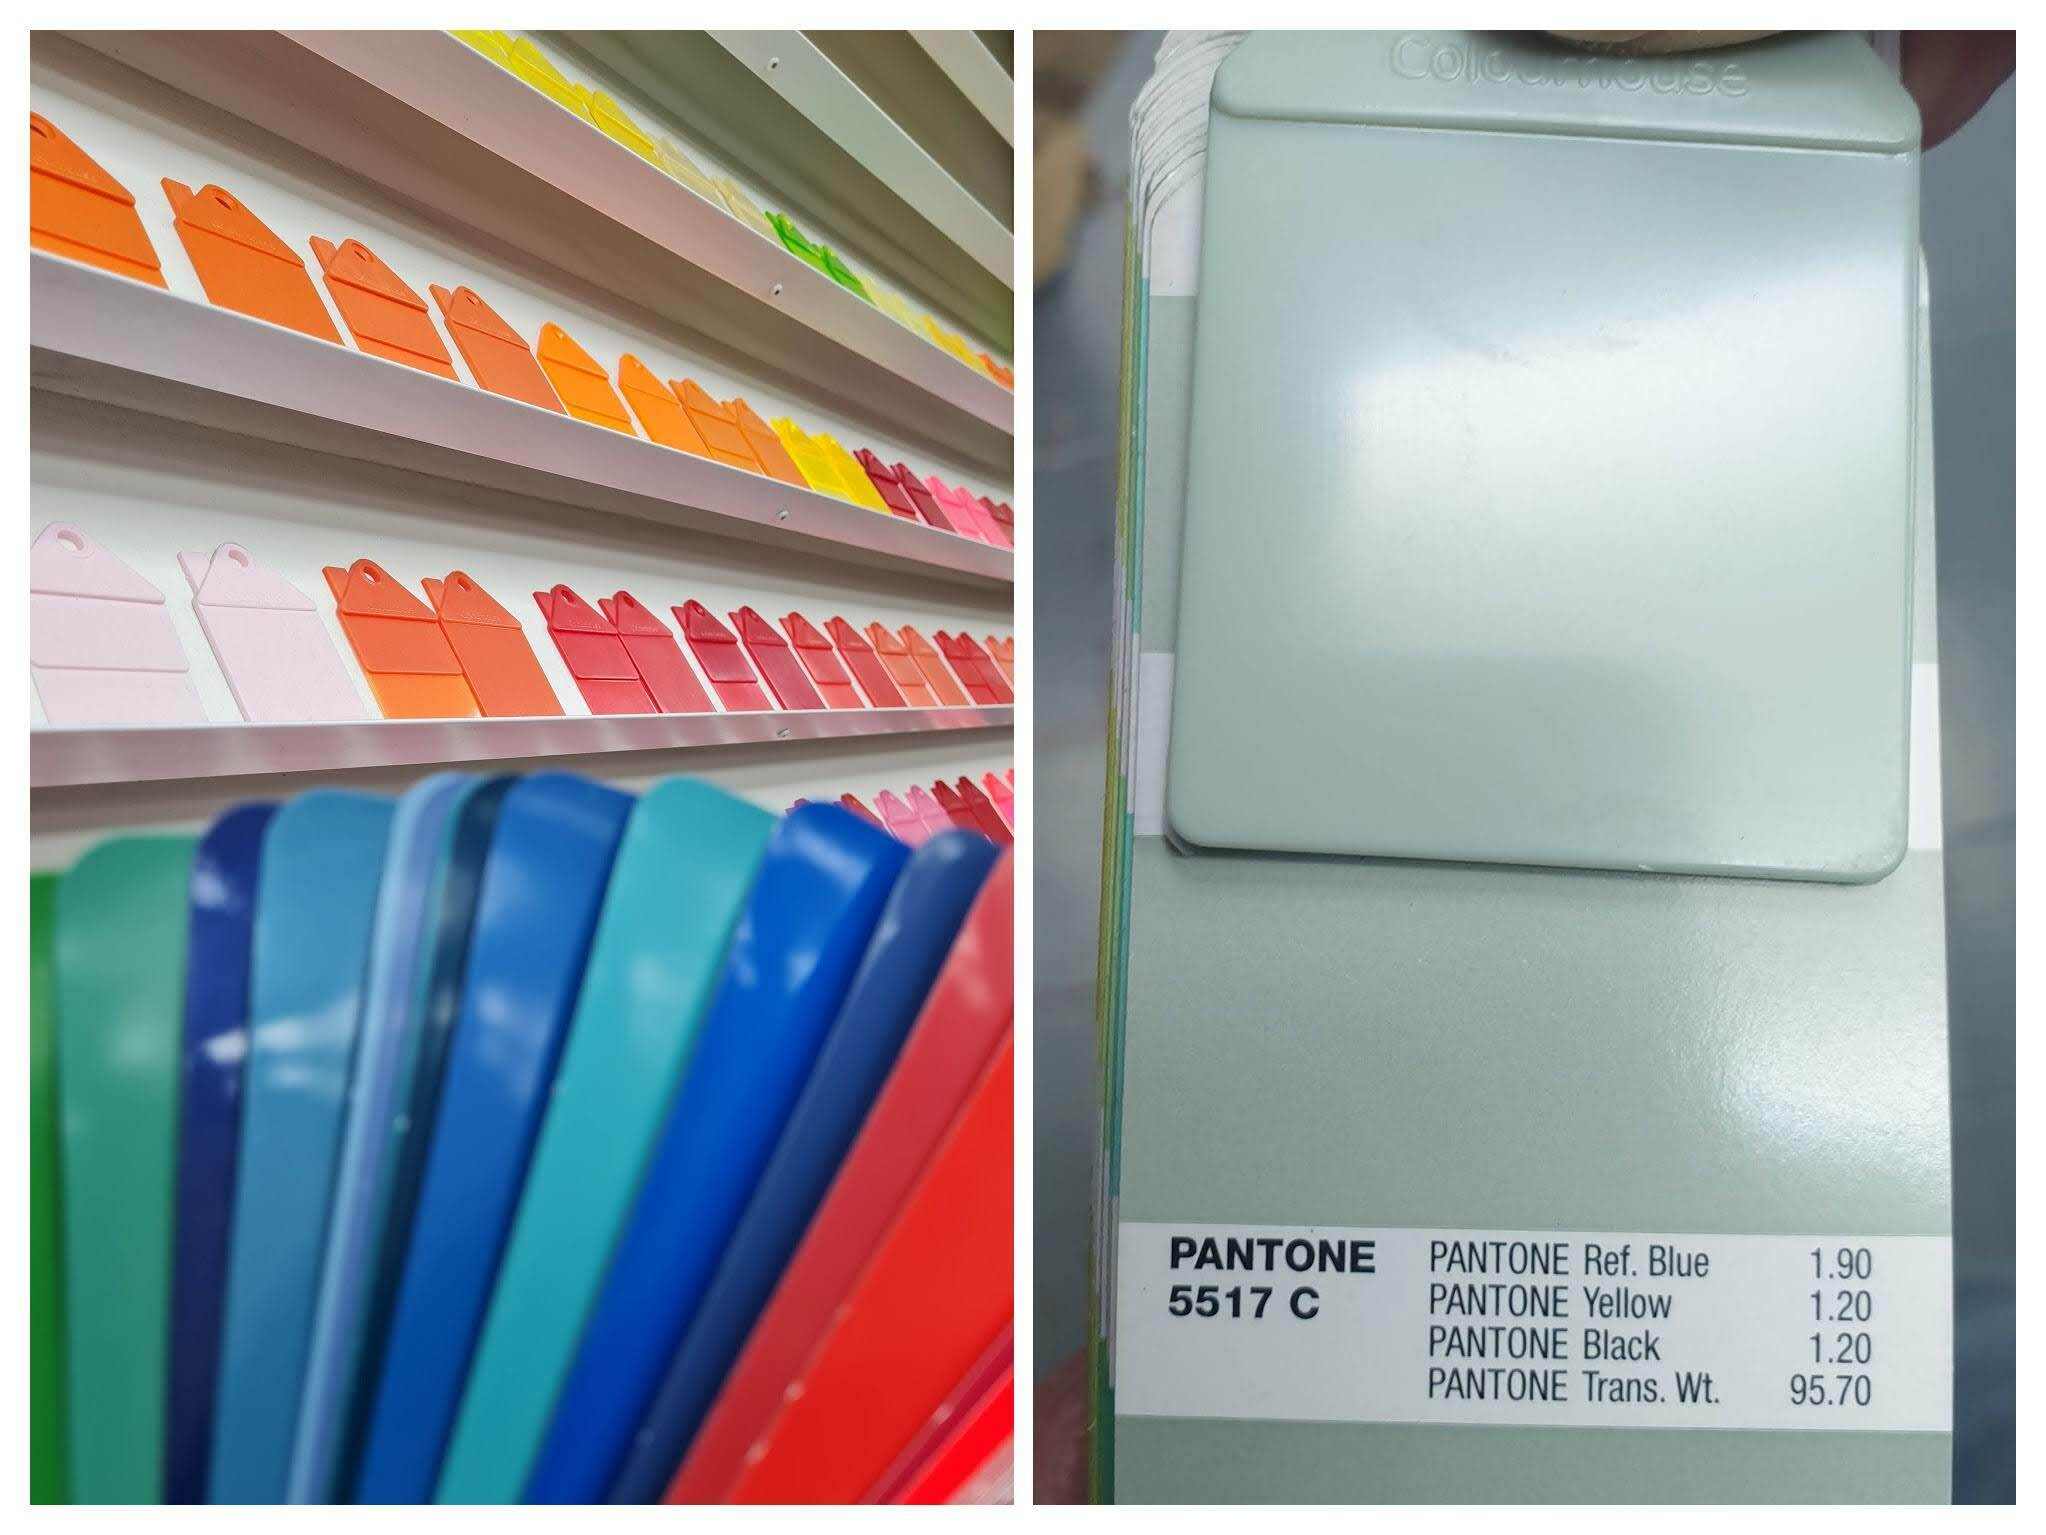 Pantone / Ral Colour Chart